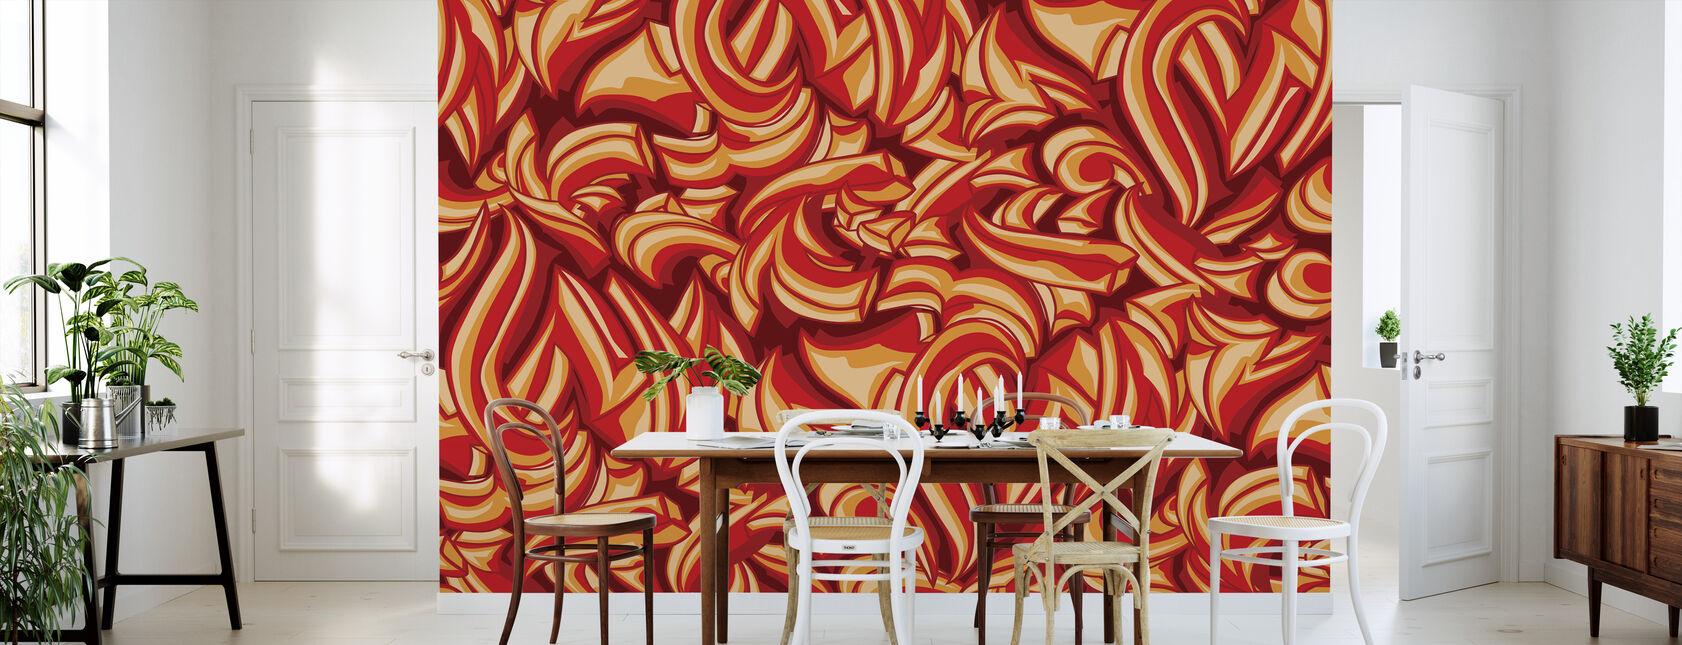 Splat Graffiti - Behang - Keuken